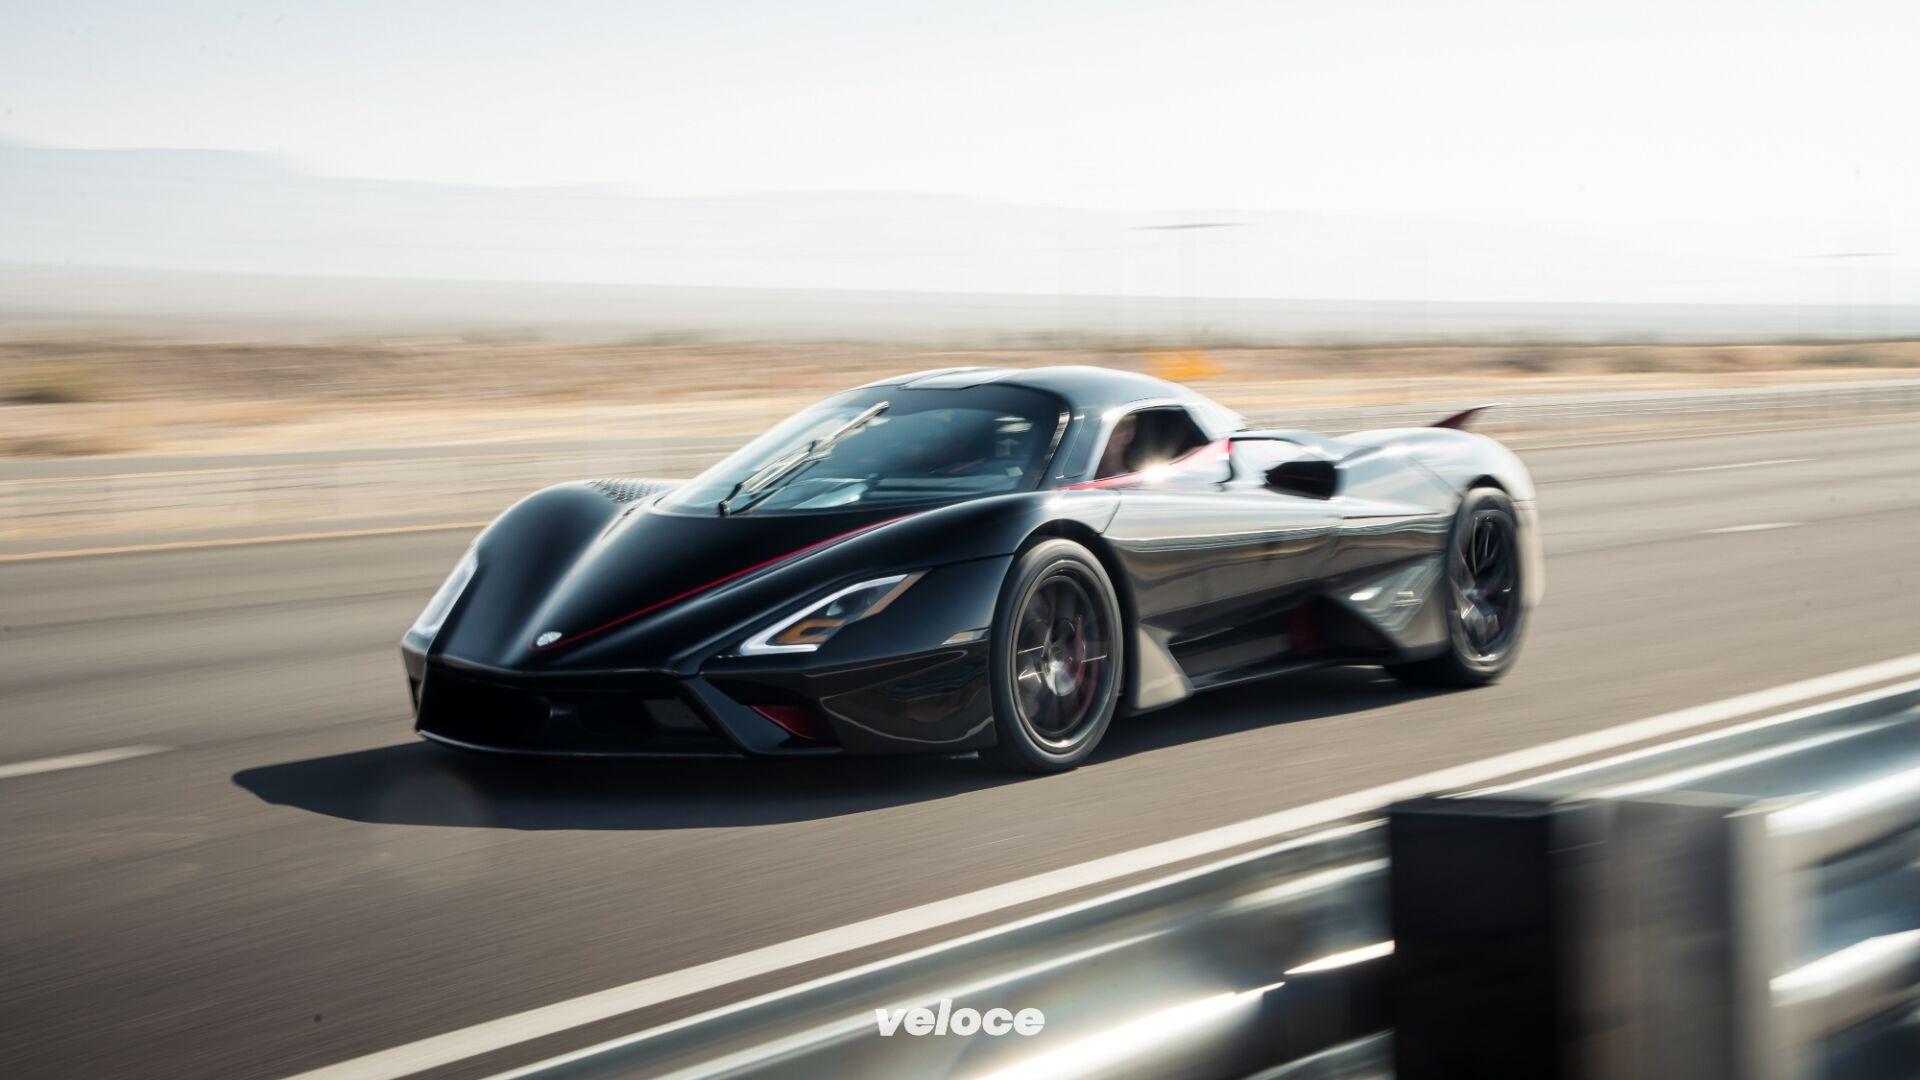 Shelby SSC Tuatara 2020 SSC-Tuatara-record-di-velocità-533-kmh-13-1920x1080